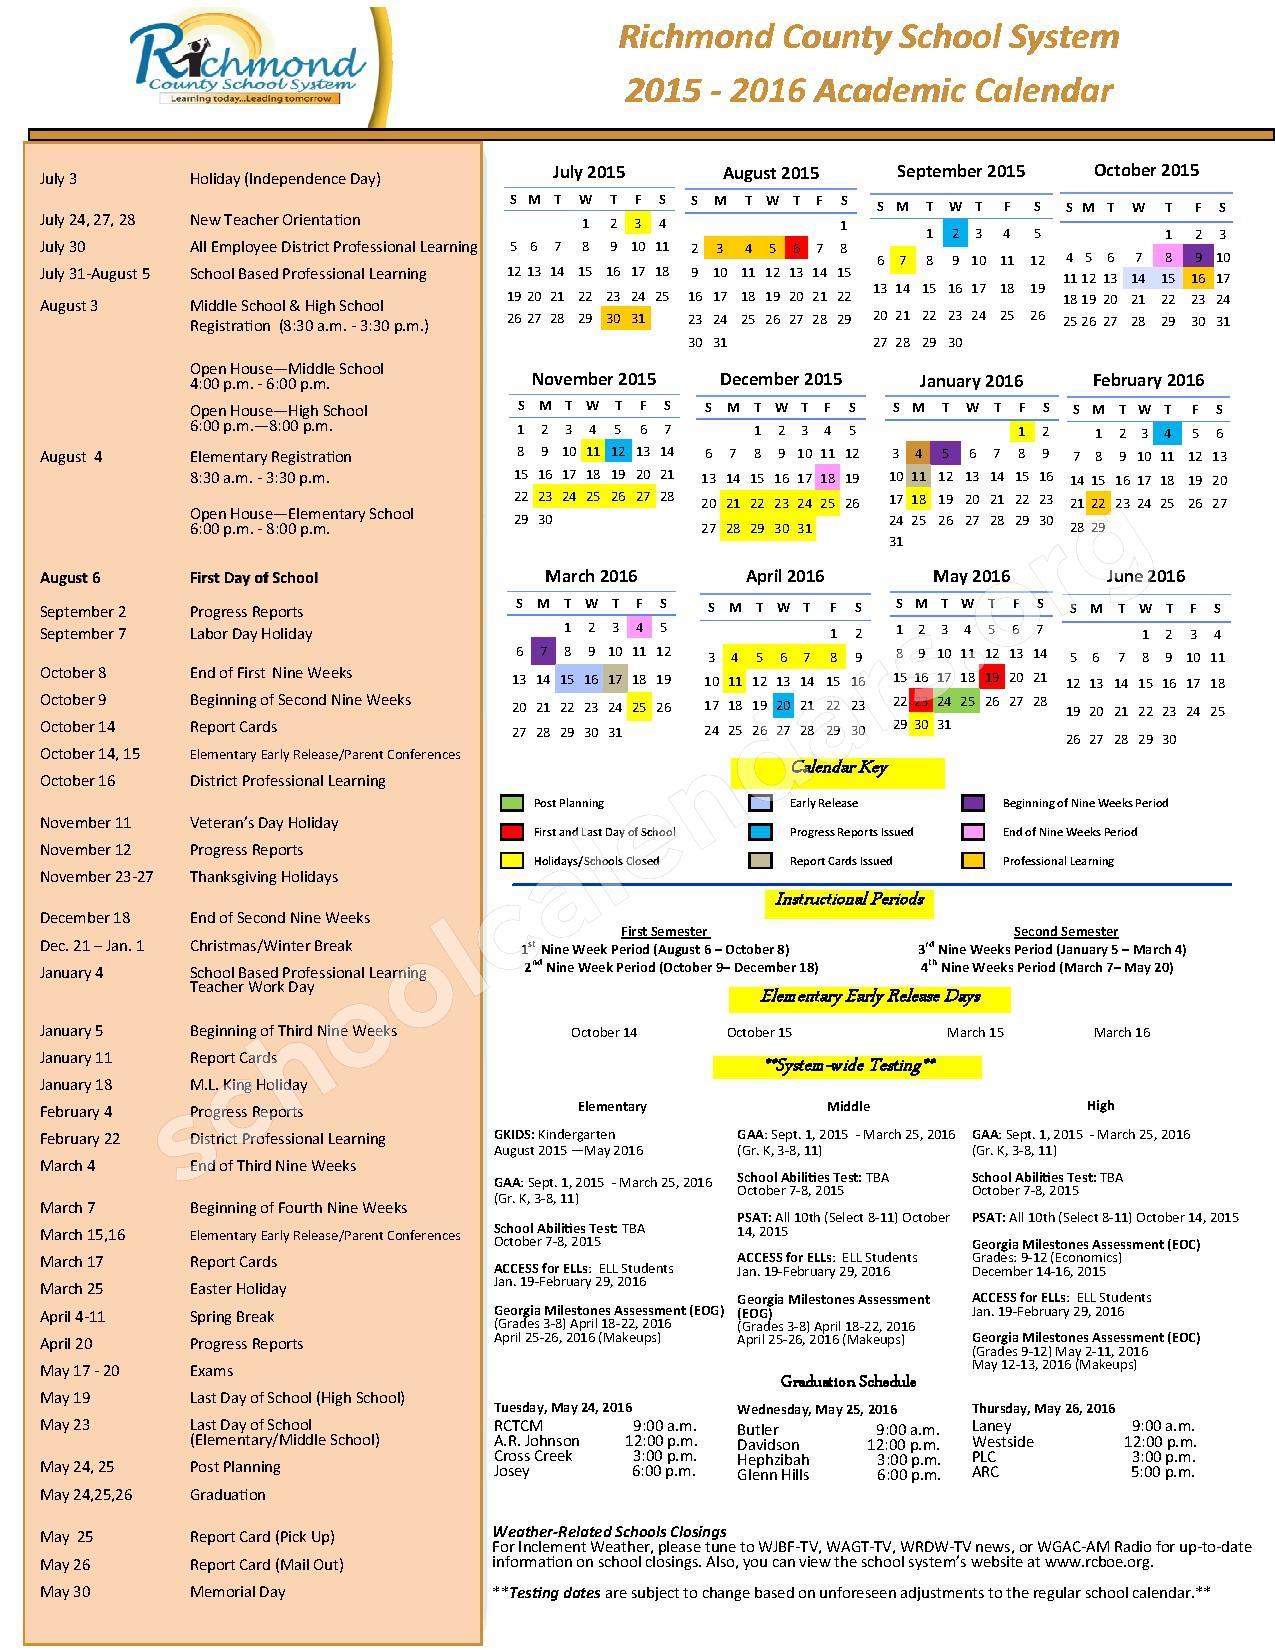 2015 - 2016 School Calendar – Richmond County School District – page 1